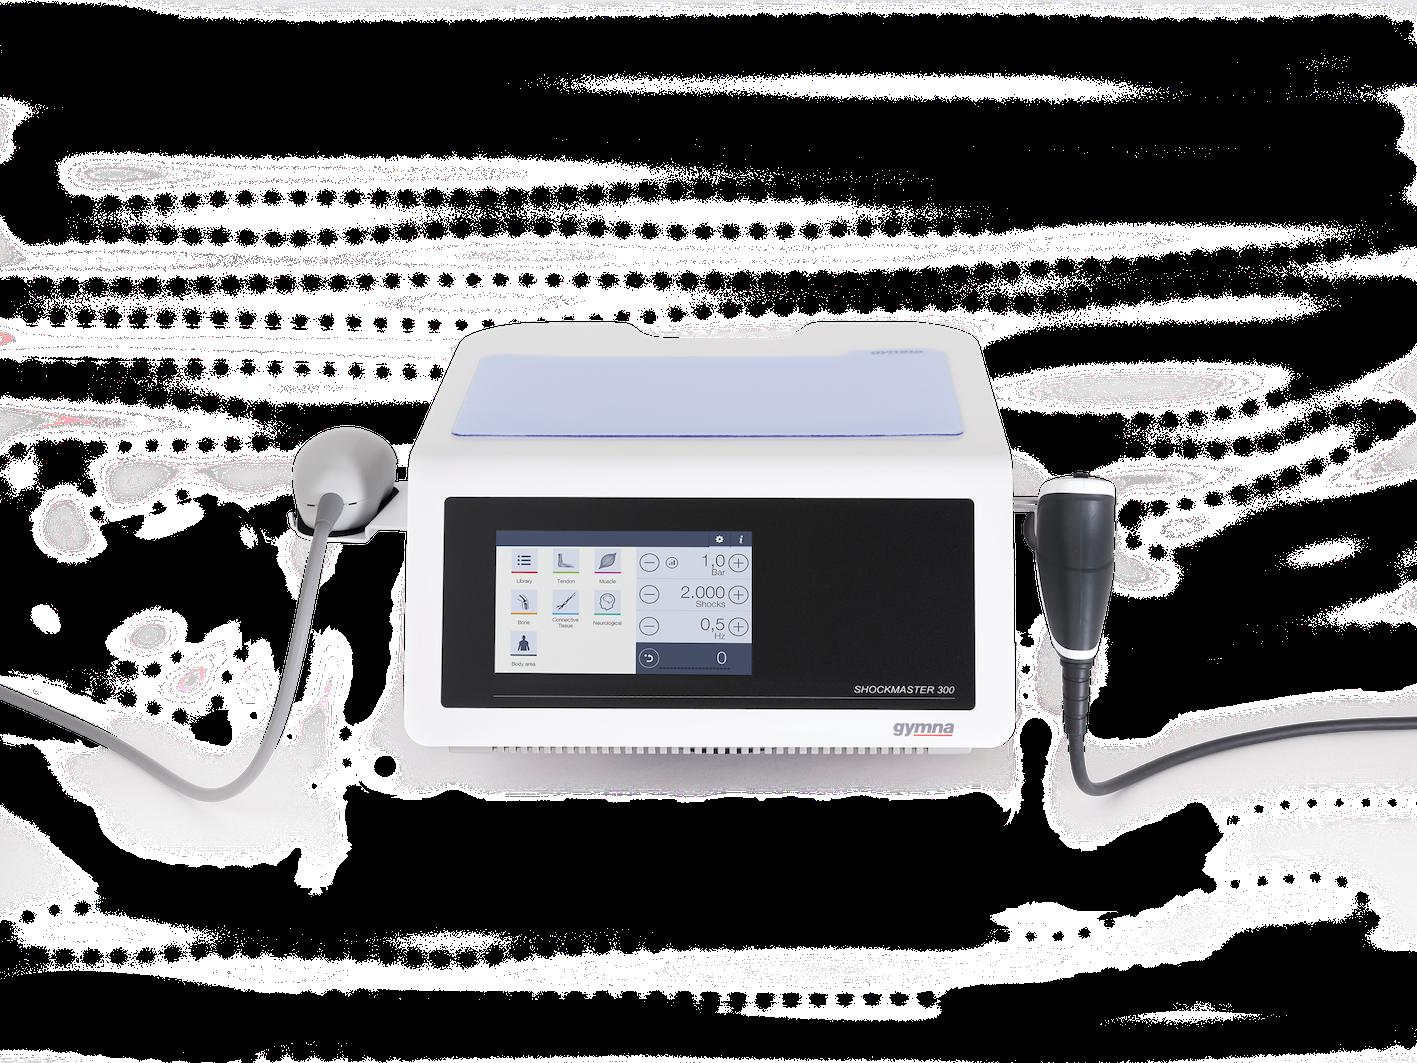 ShockMaster 300